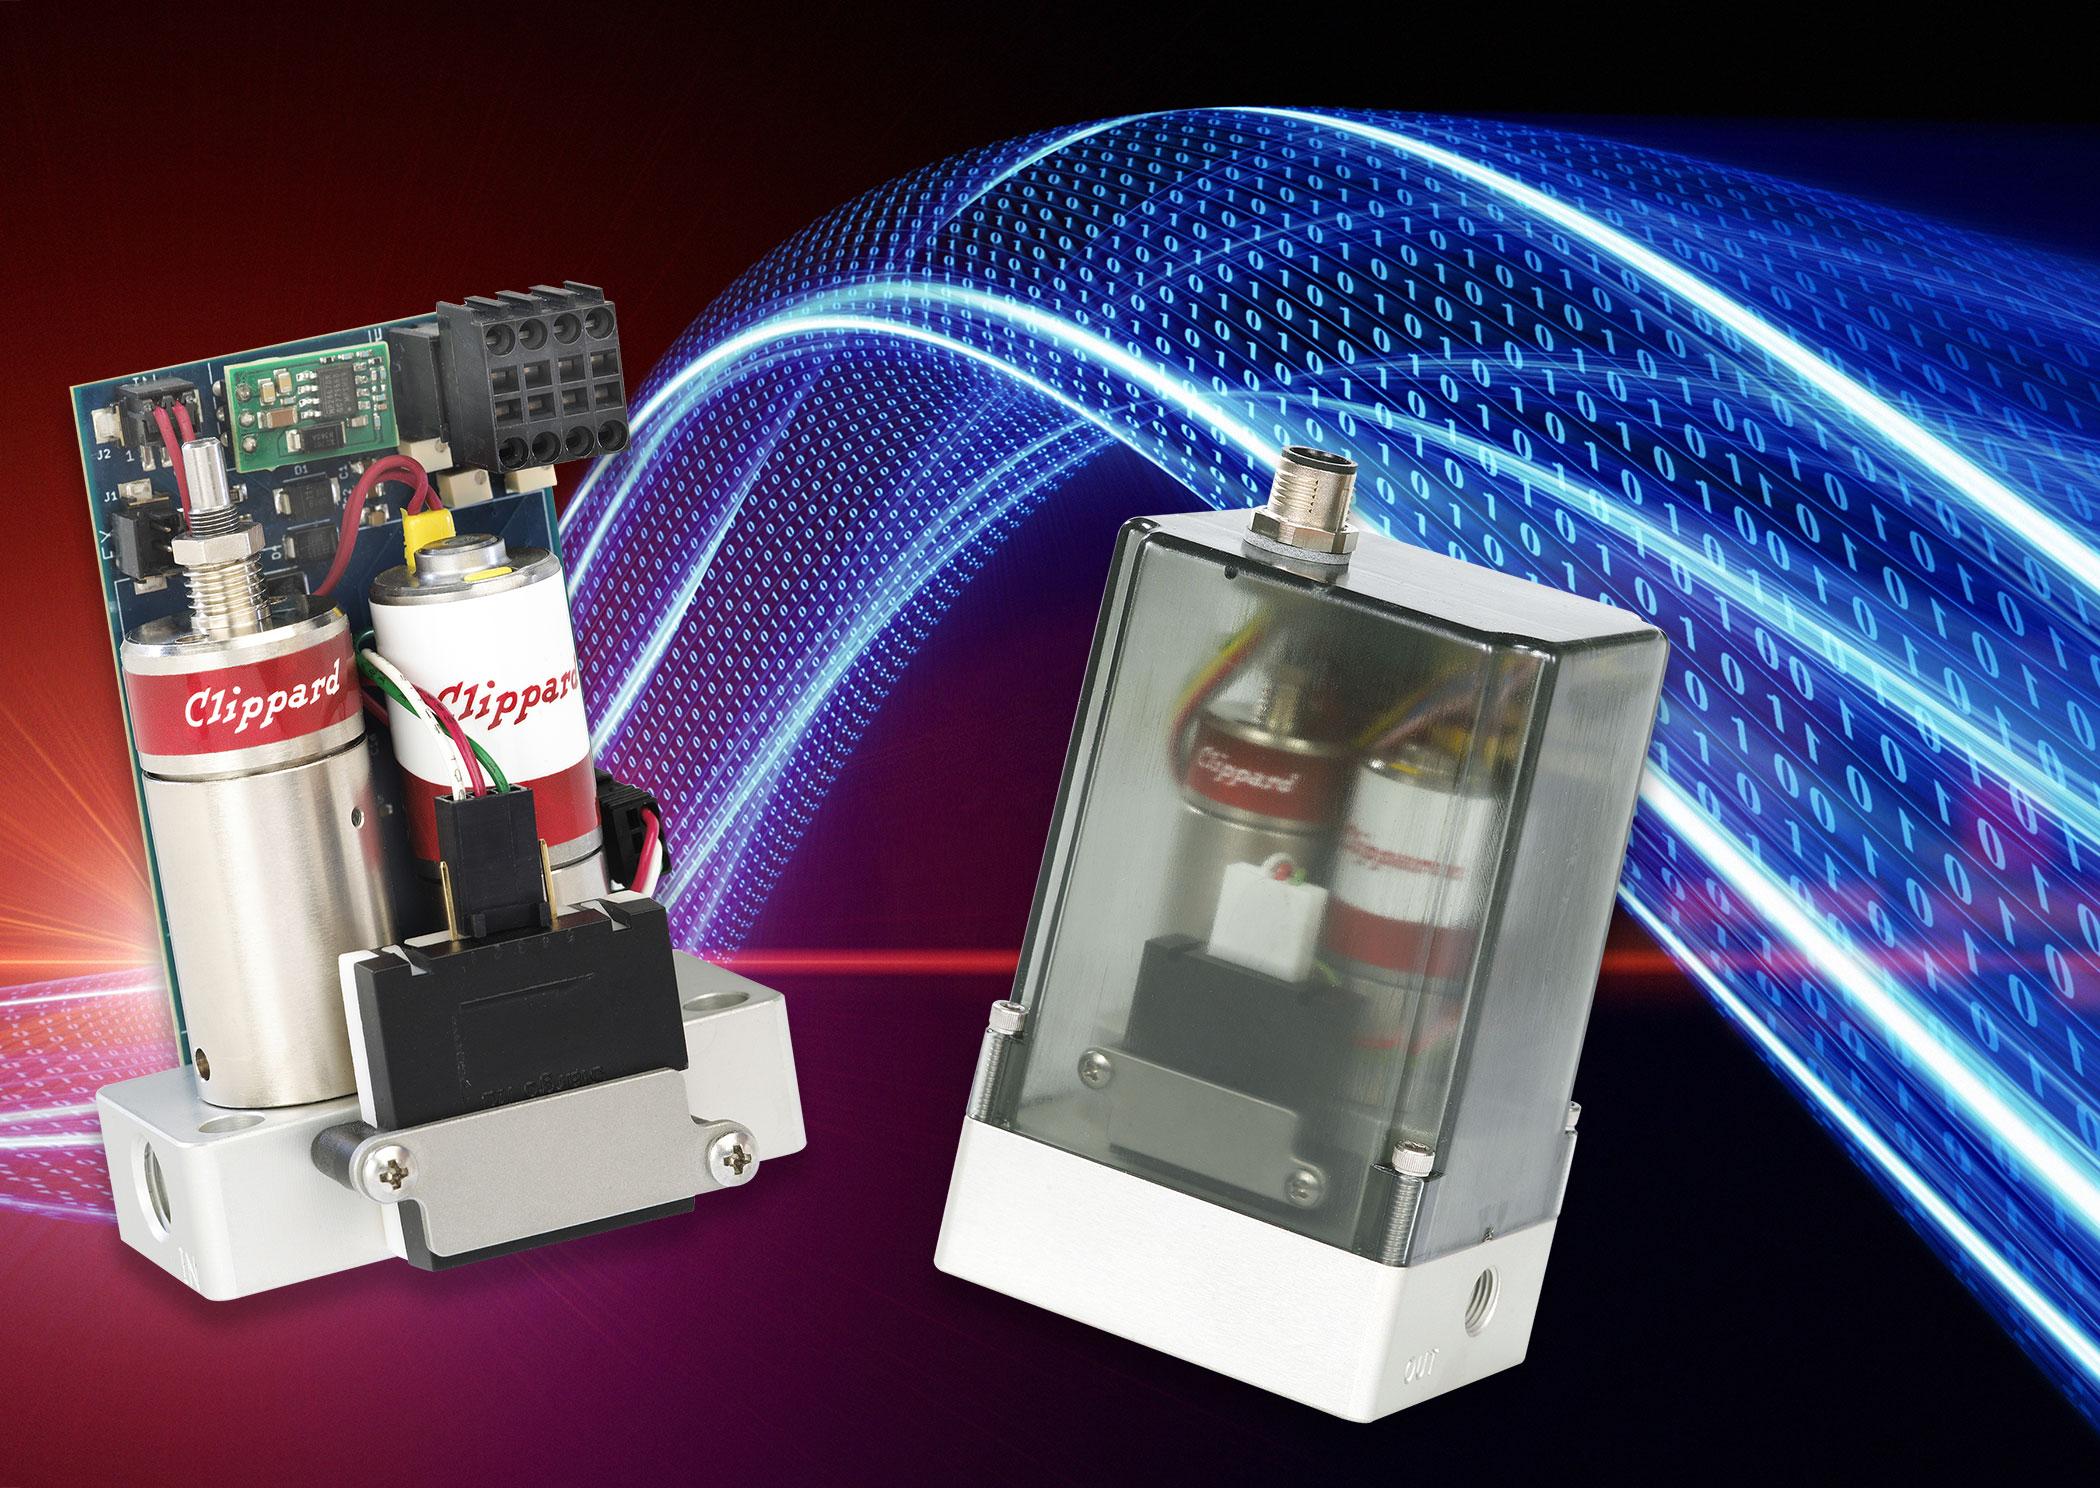 Clippard Cordis: Electronic Flow Controller